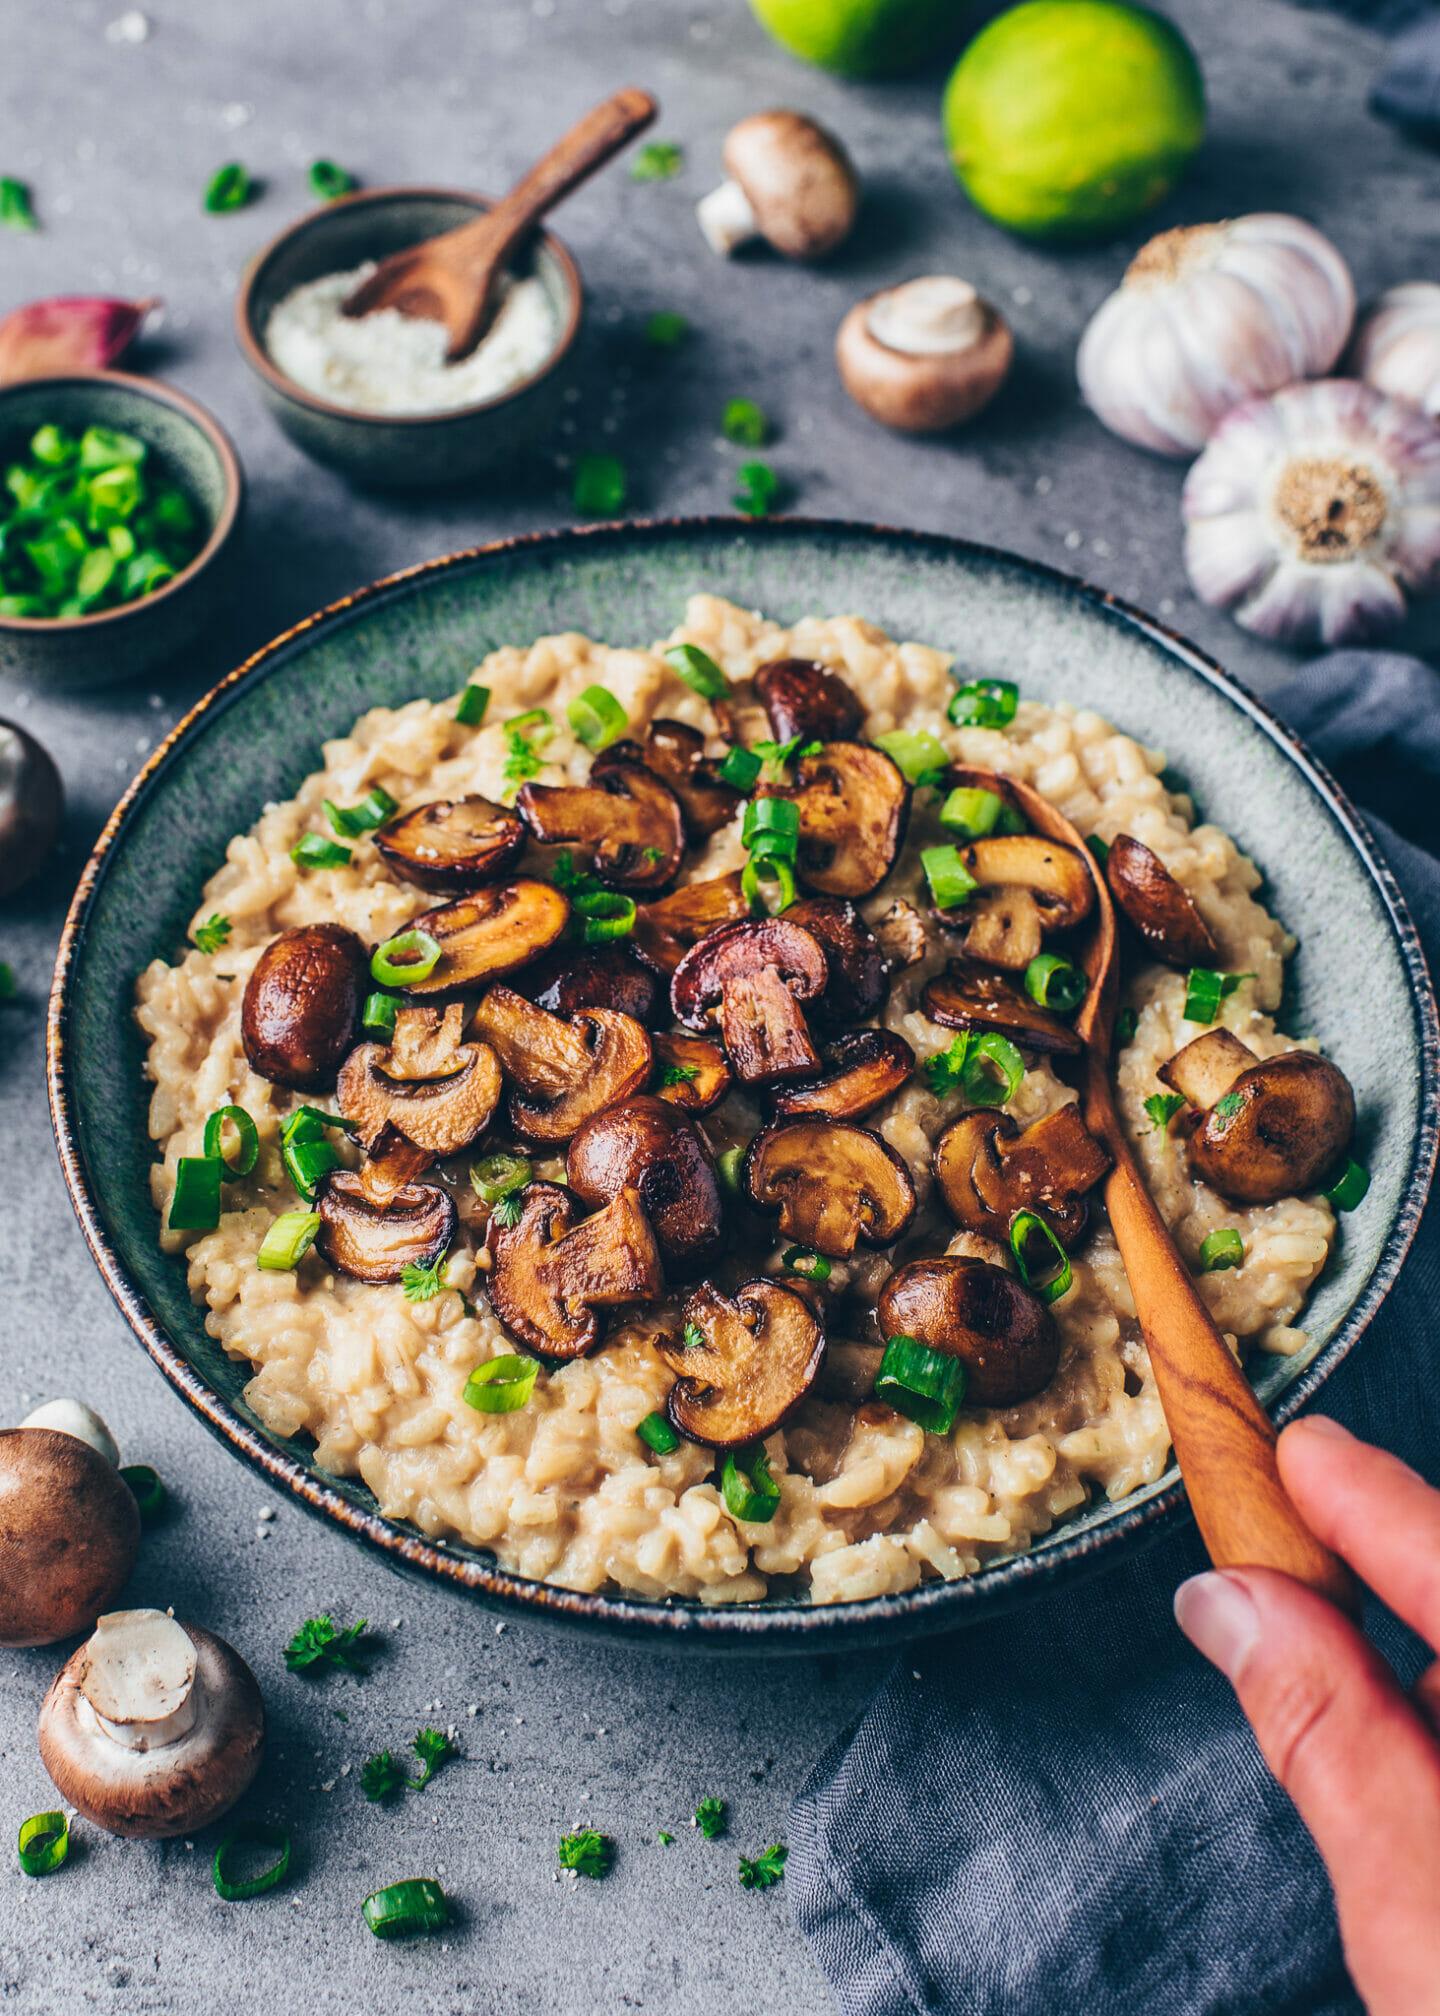 Creamy Mushroom Risotto Best Vegan Recipe Bianca Zapatka Rezepte